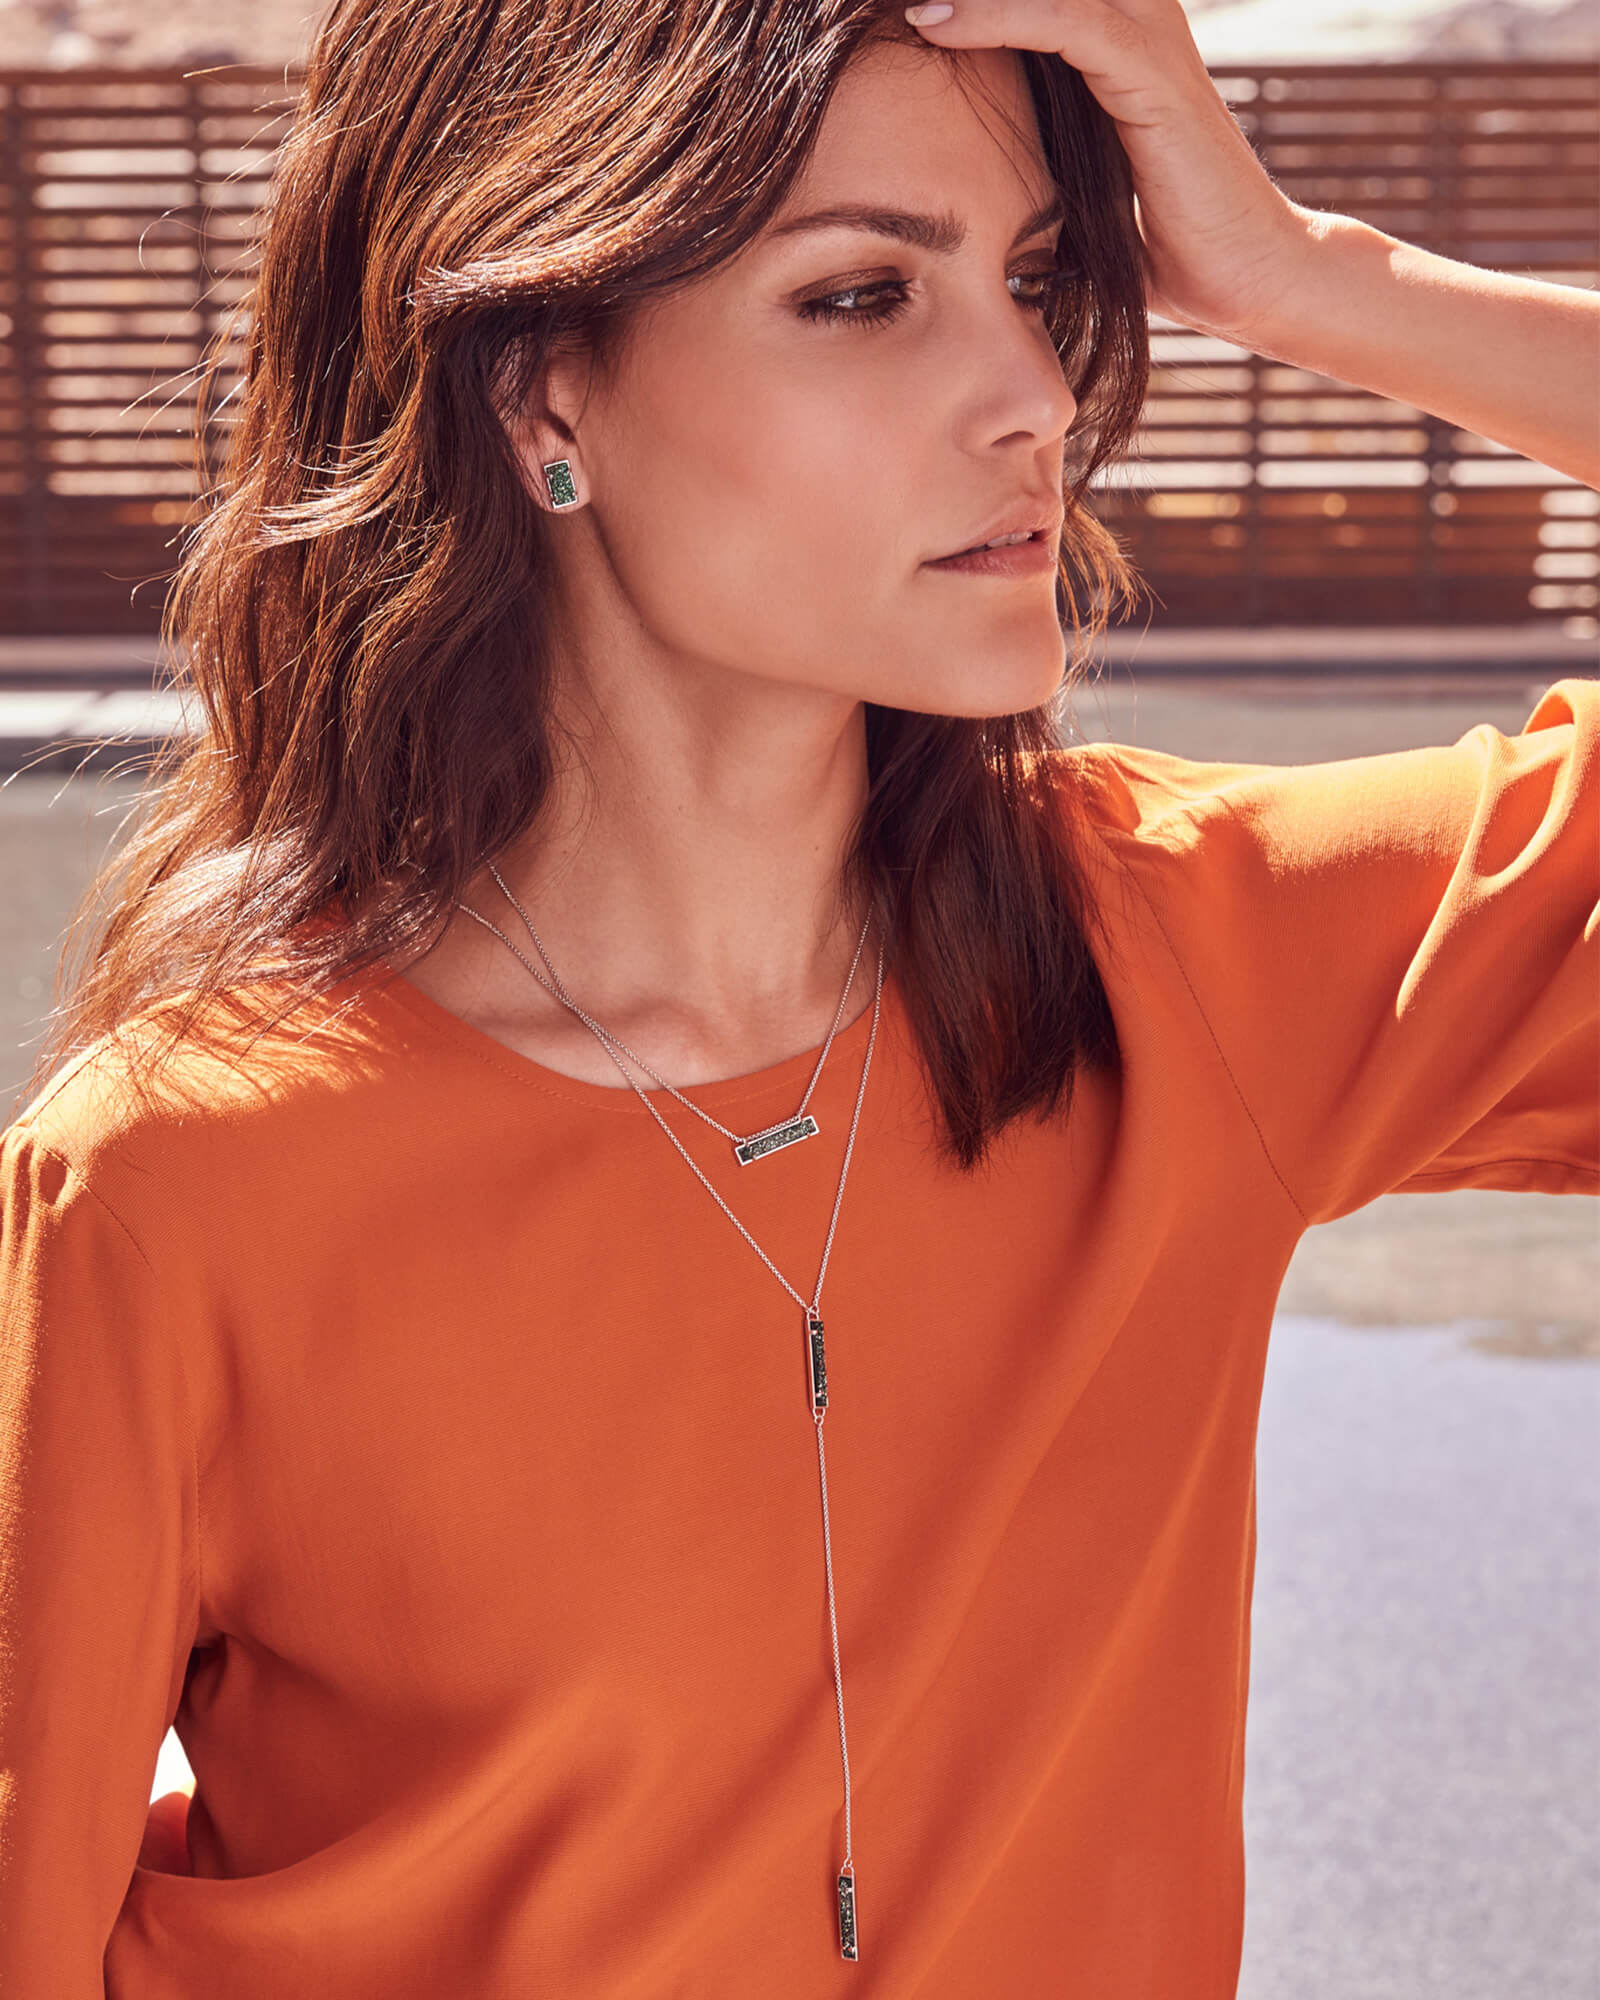 kendra-scott-lilly-y-necklace-in-drusy_02_default_lg.jpg